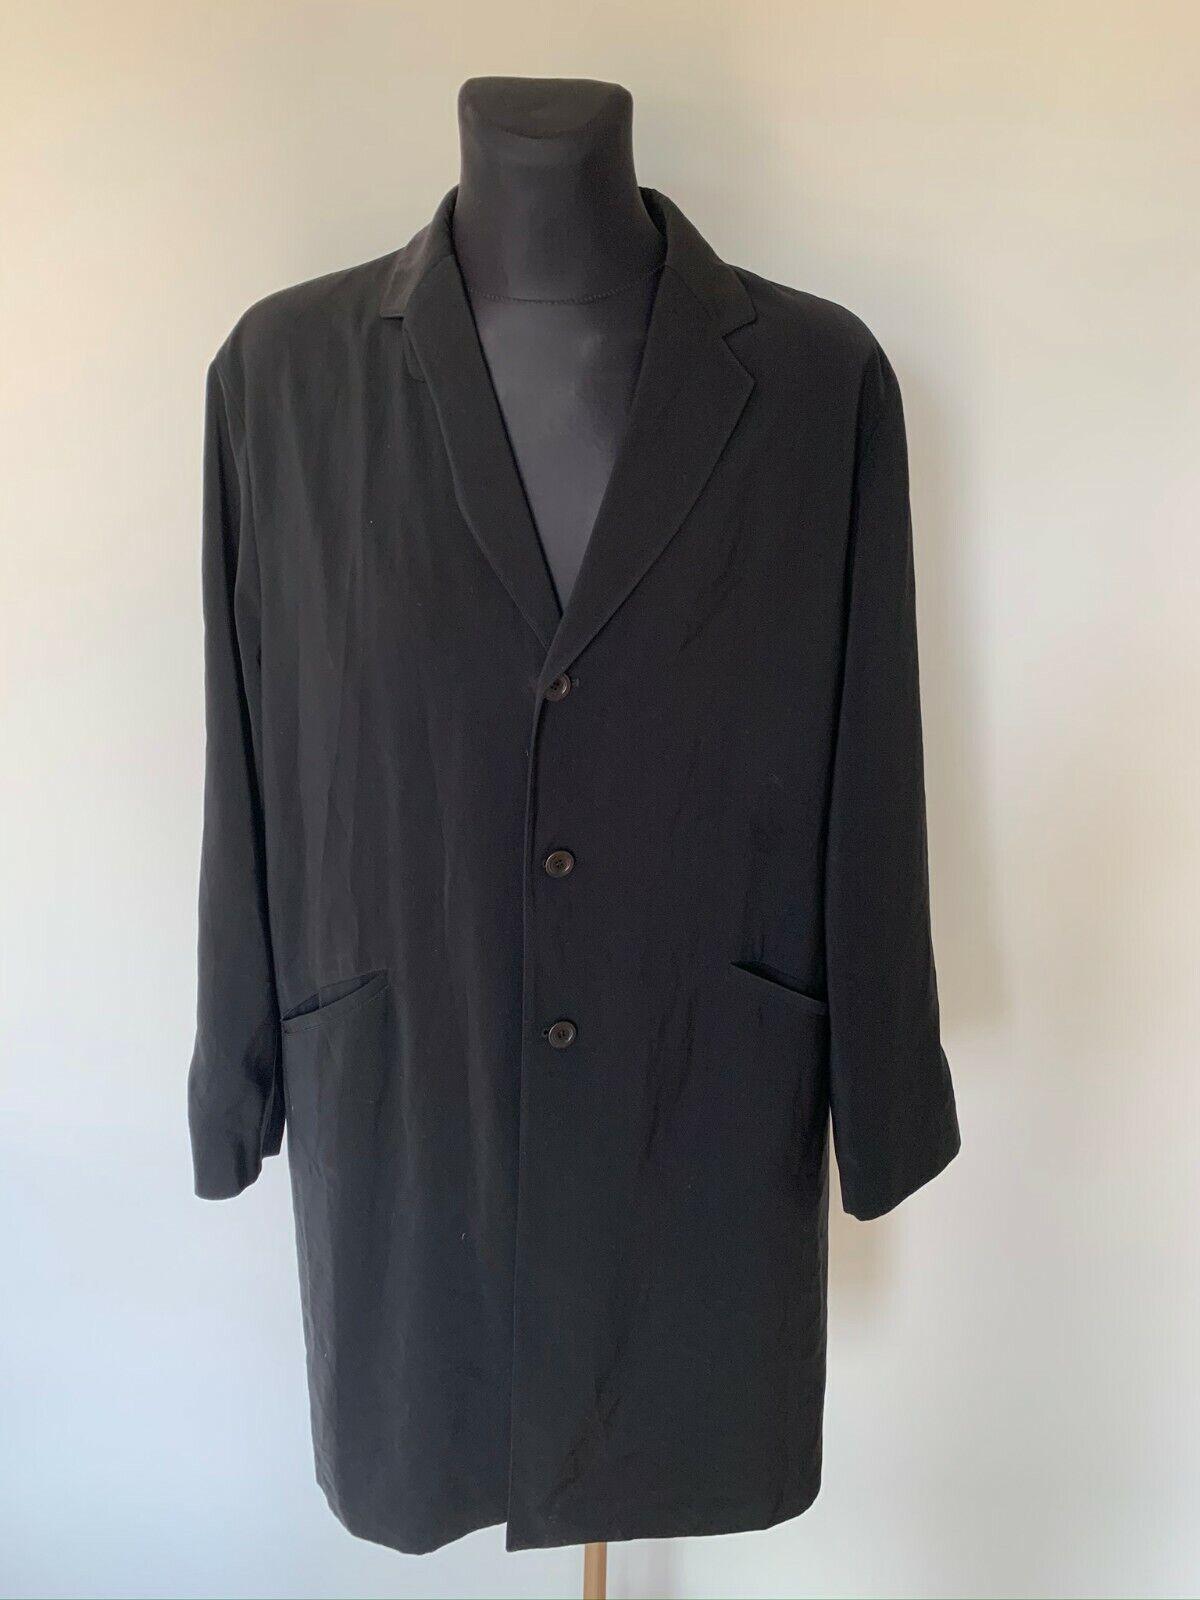 Men GIORGIO ARMANI long schwarz light coat Größe 54